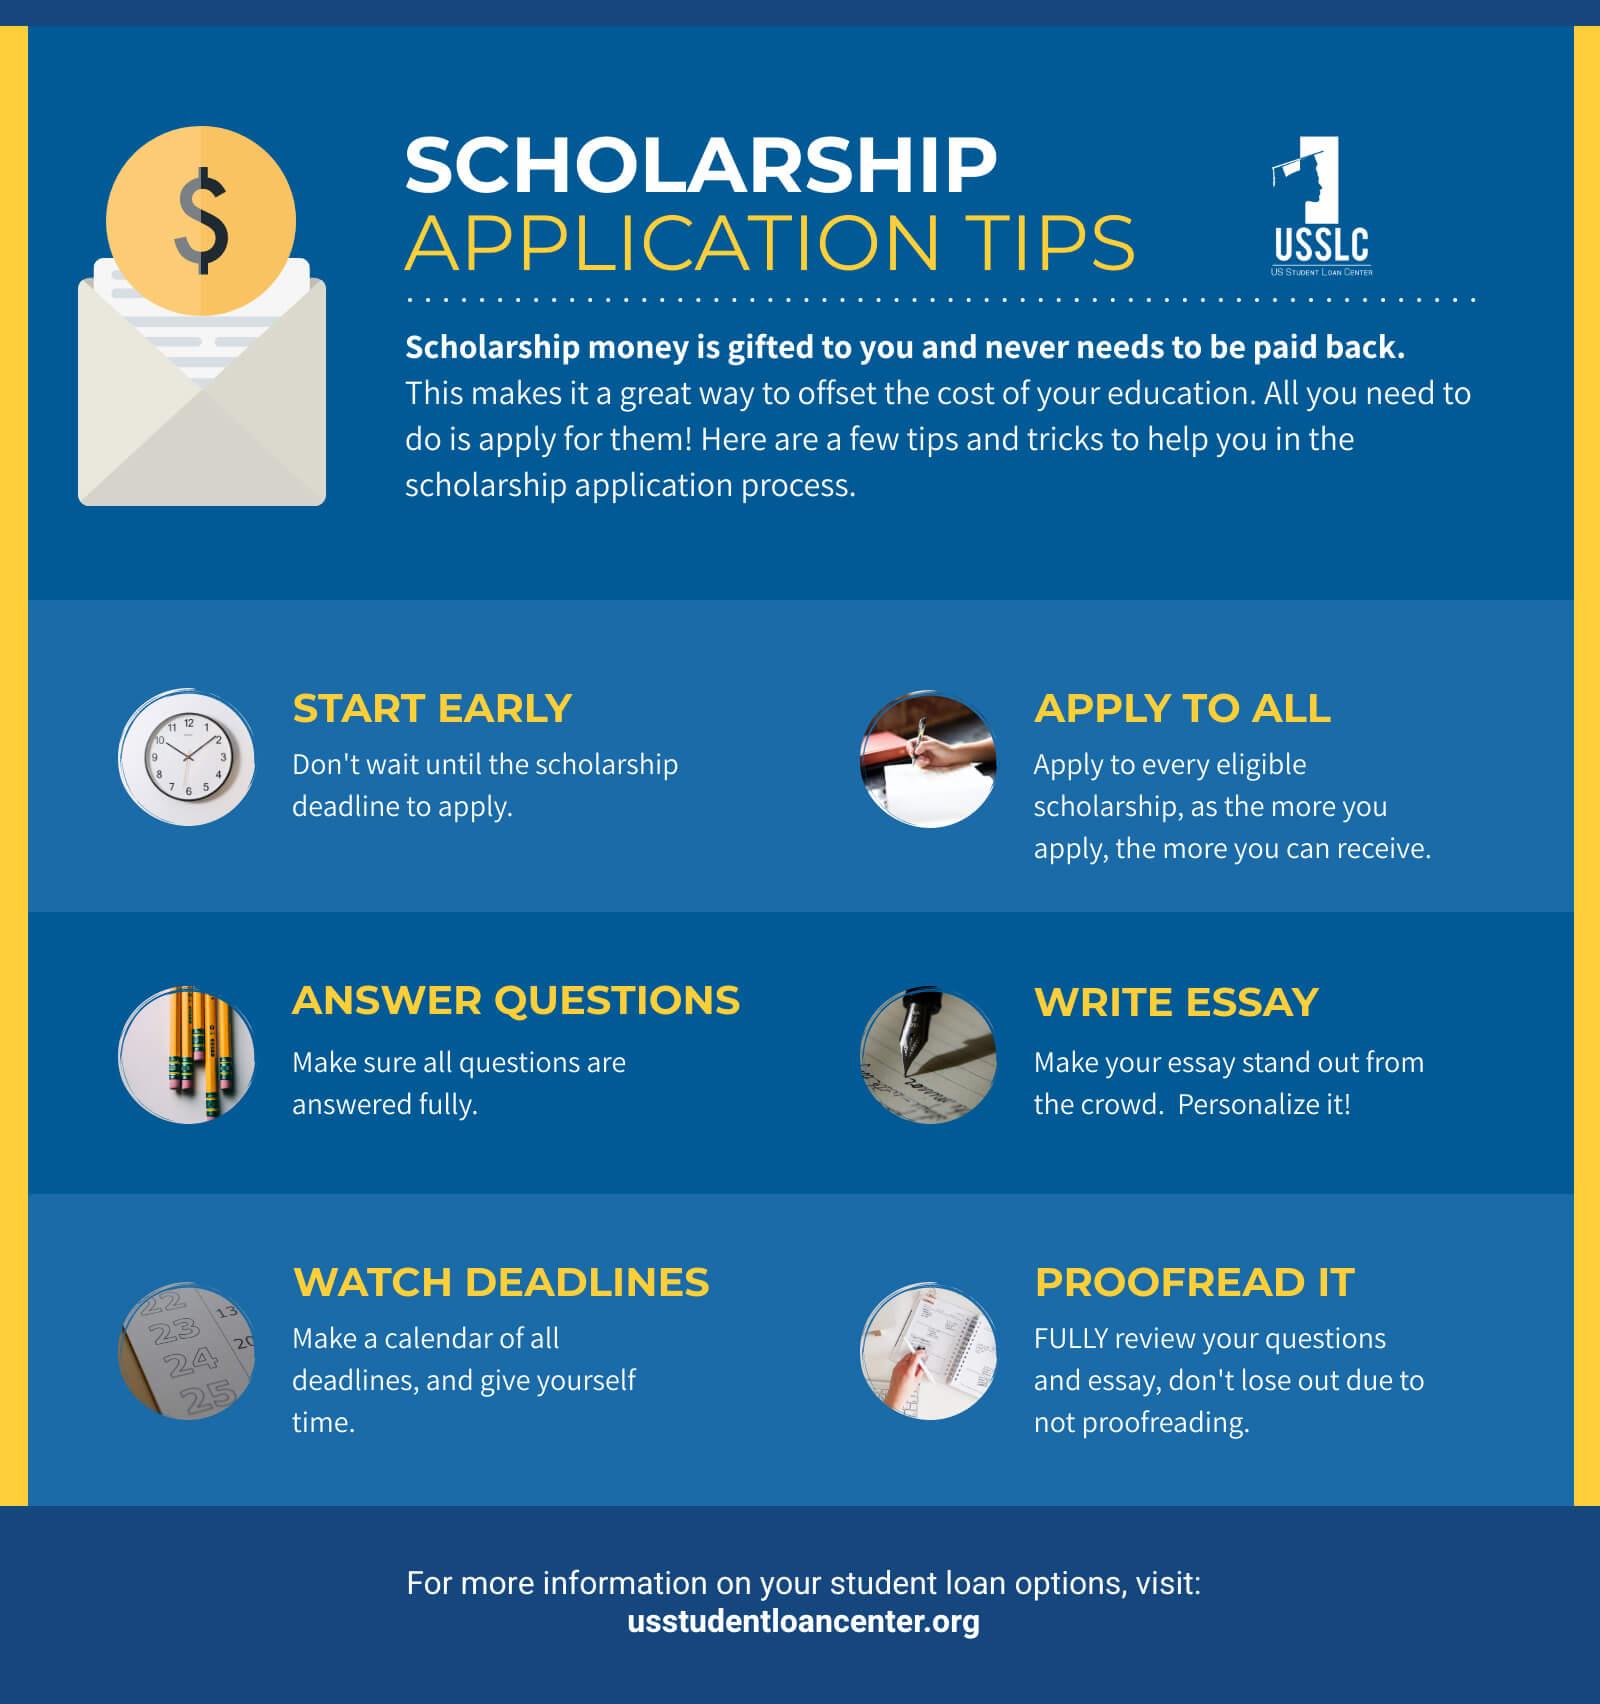 scholarships for moms application tips - 1